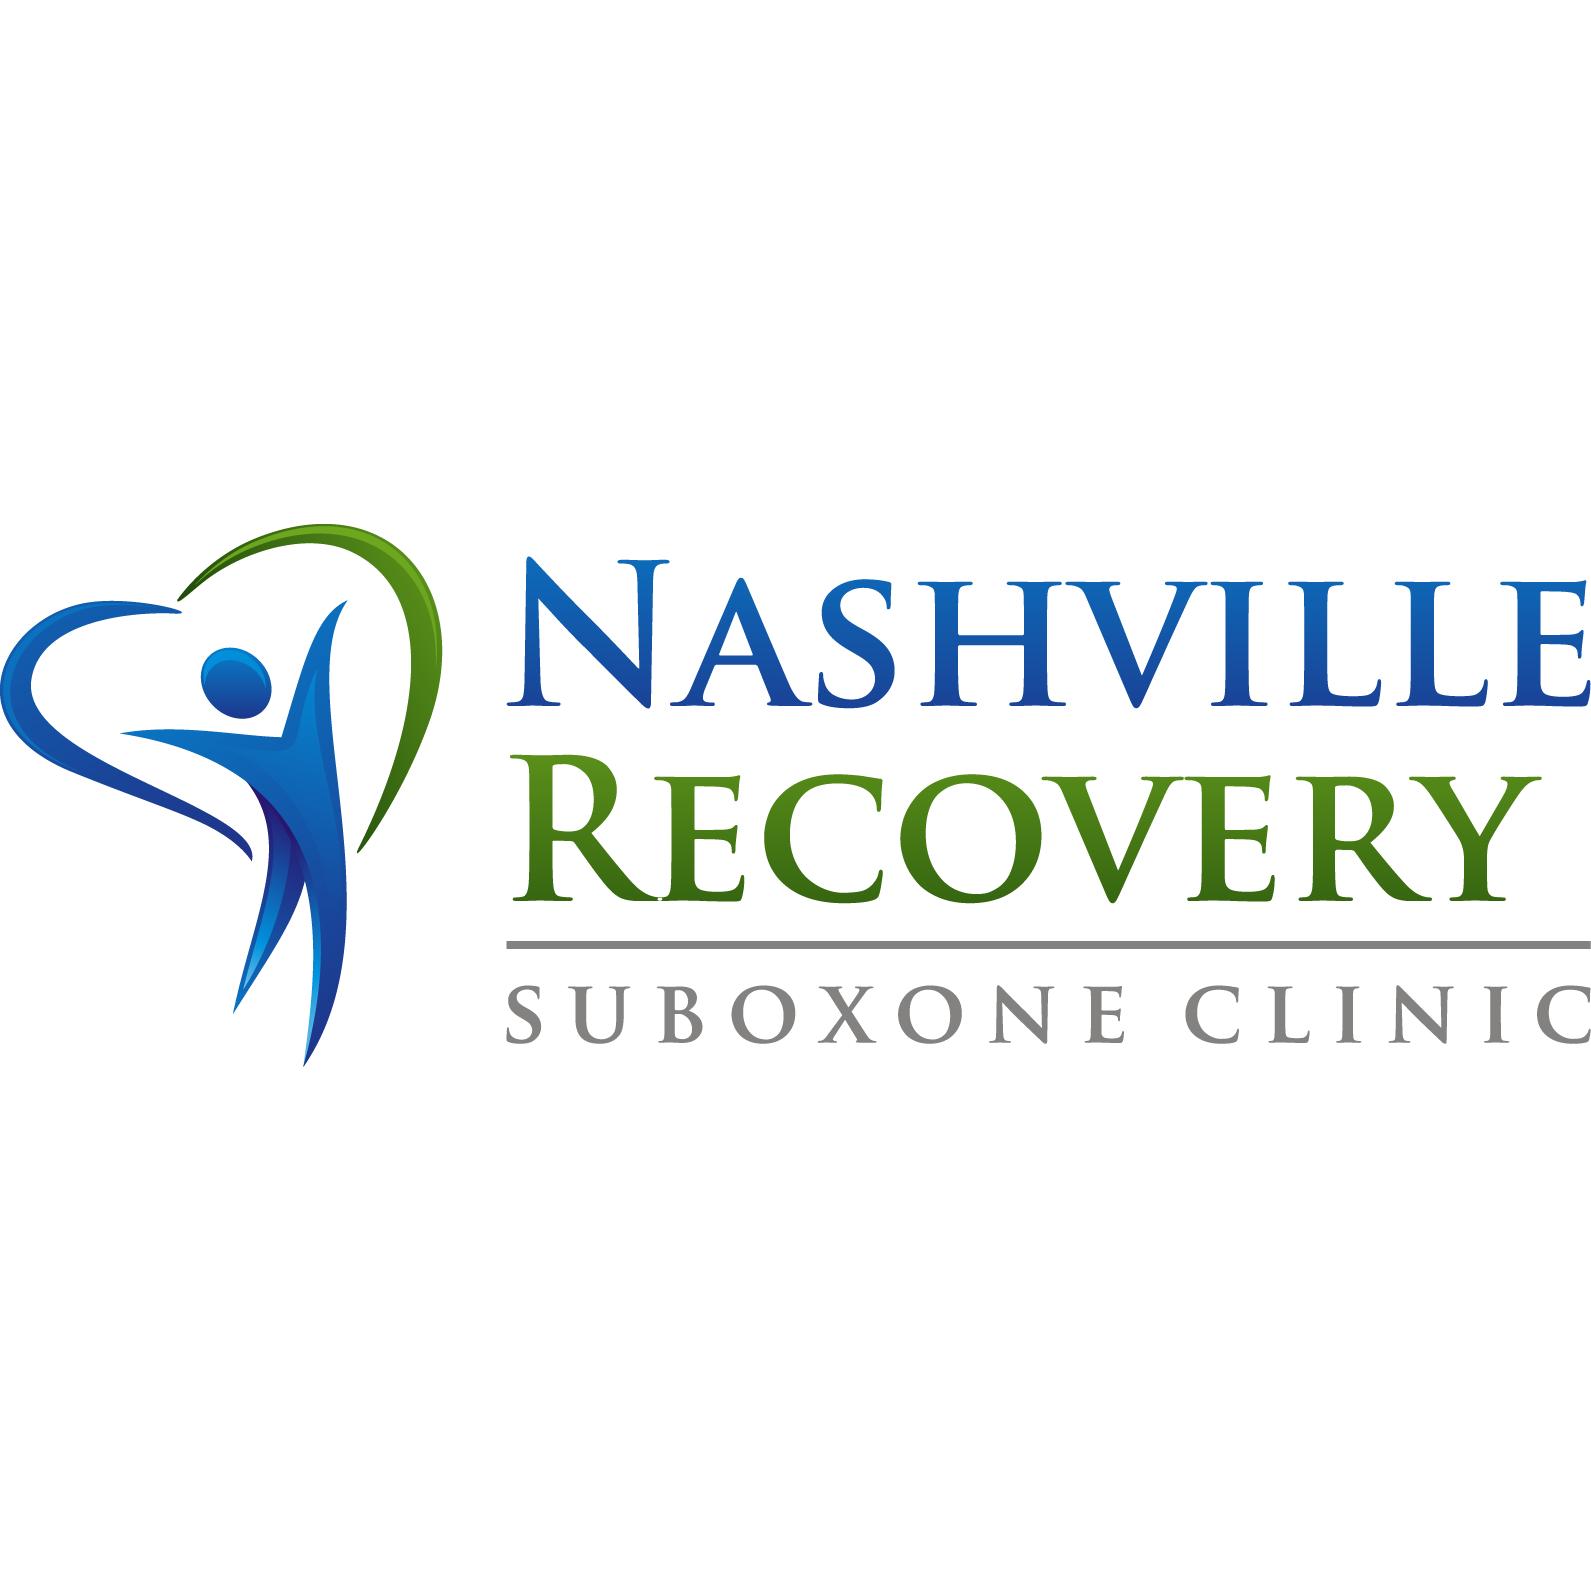 Nashville Suboxone Recovery - Nashville, TN 37211 - (615)431-3701 | ShowMeLocal.com